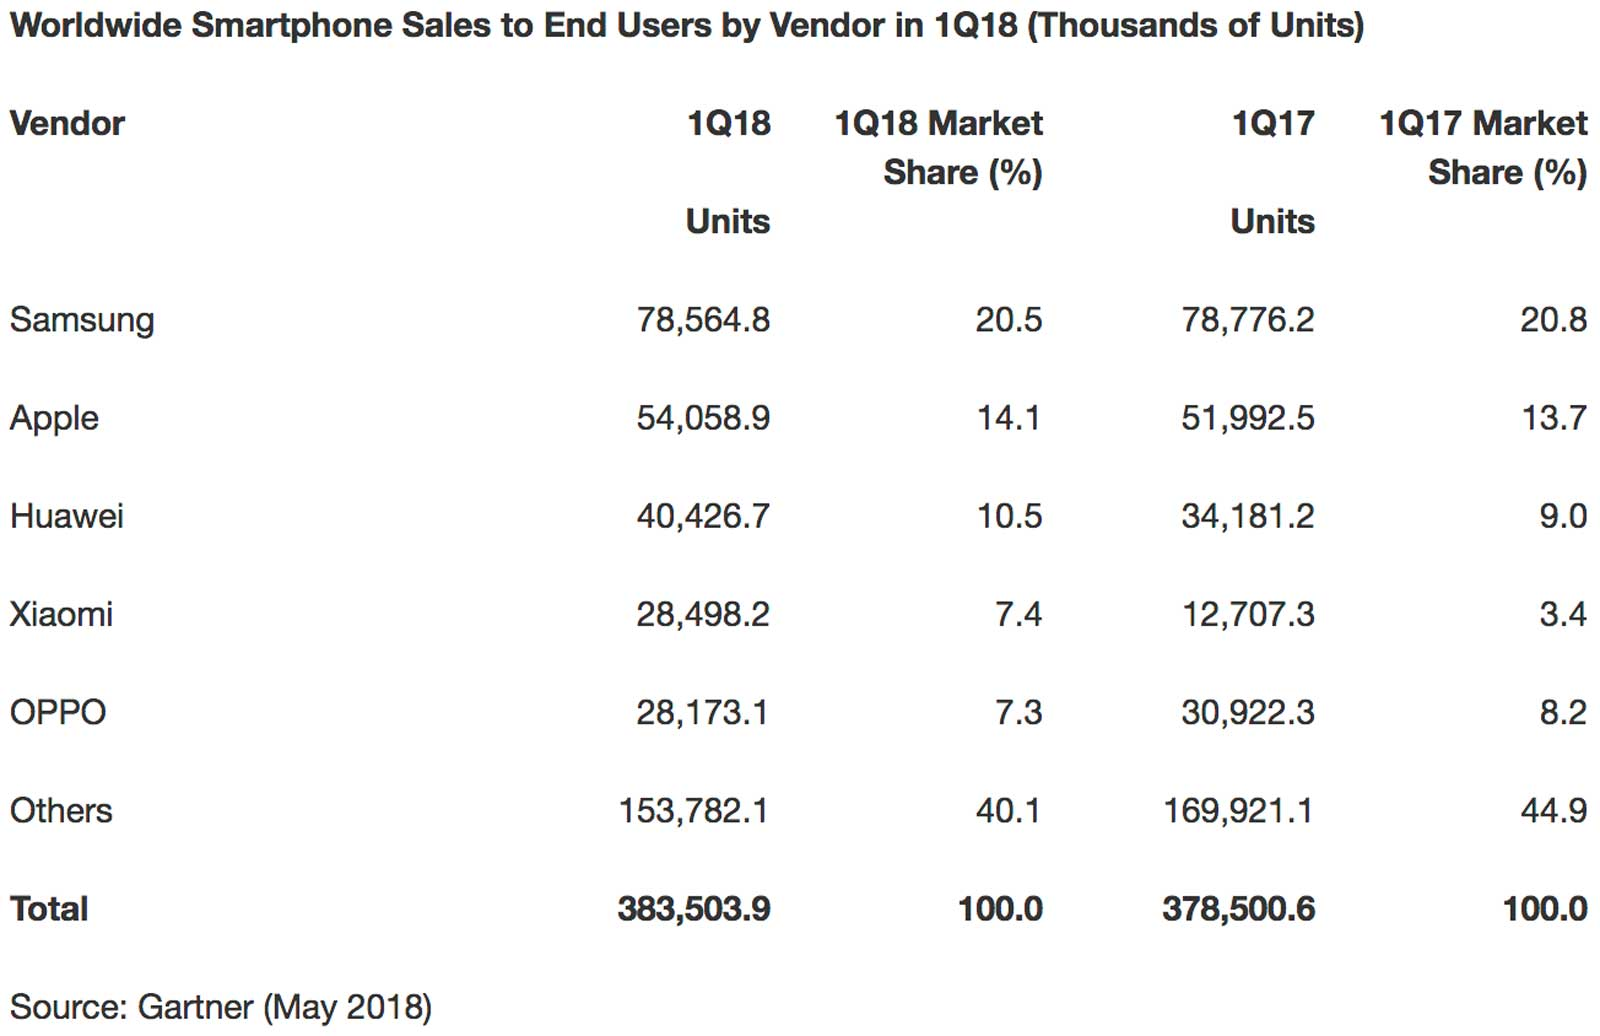 Smartphone sales in Q1 2018